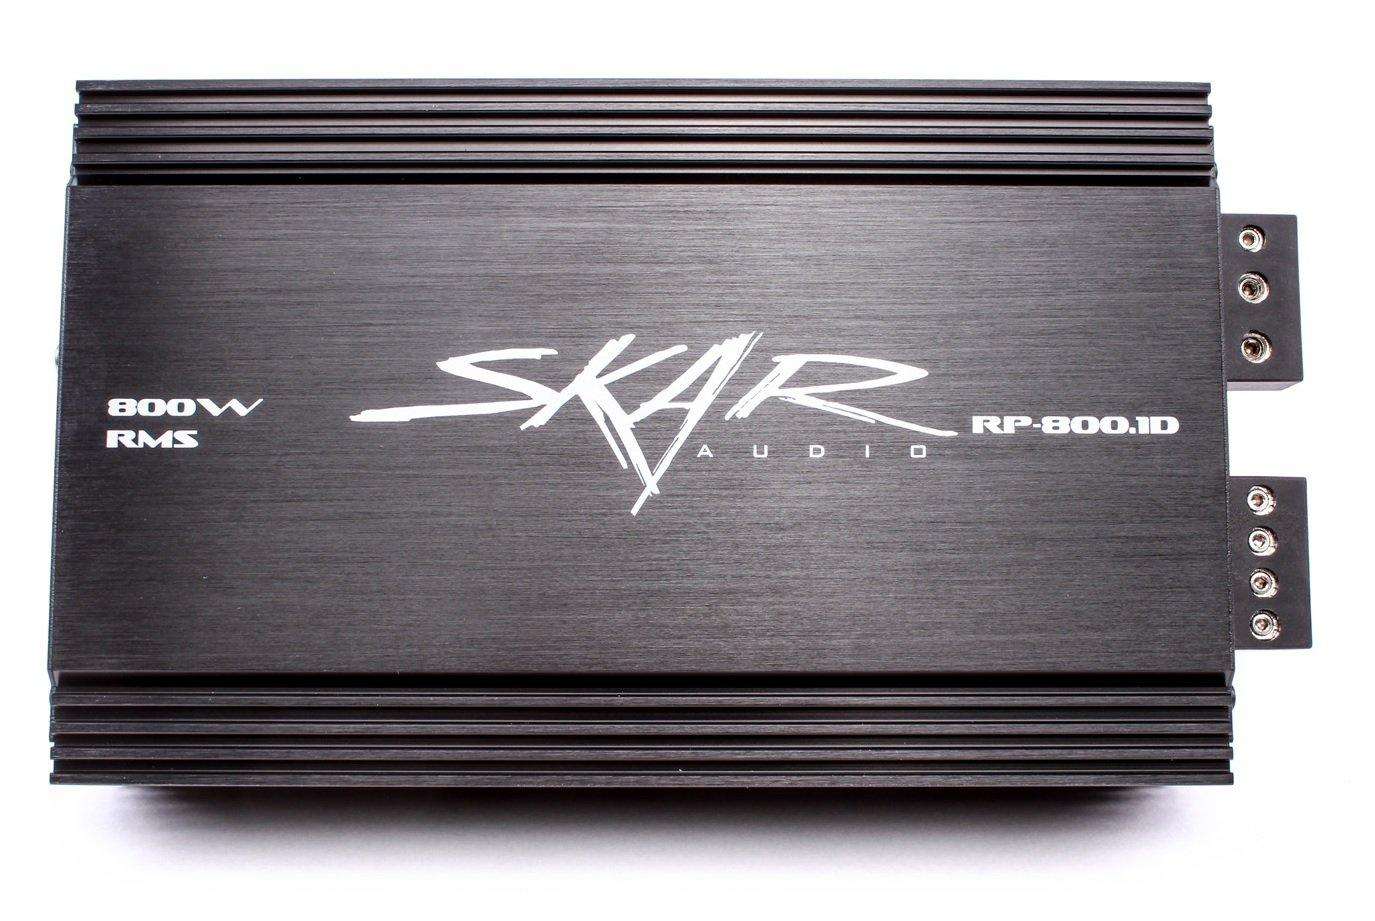 Amazon.com: Skar Audio RP-800.1D Monoblock Class D MOSET Amplifier ...